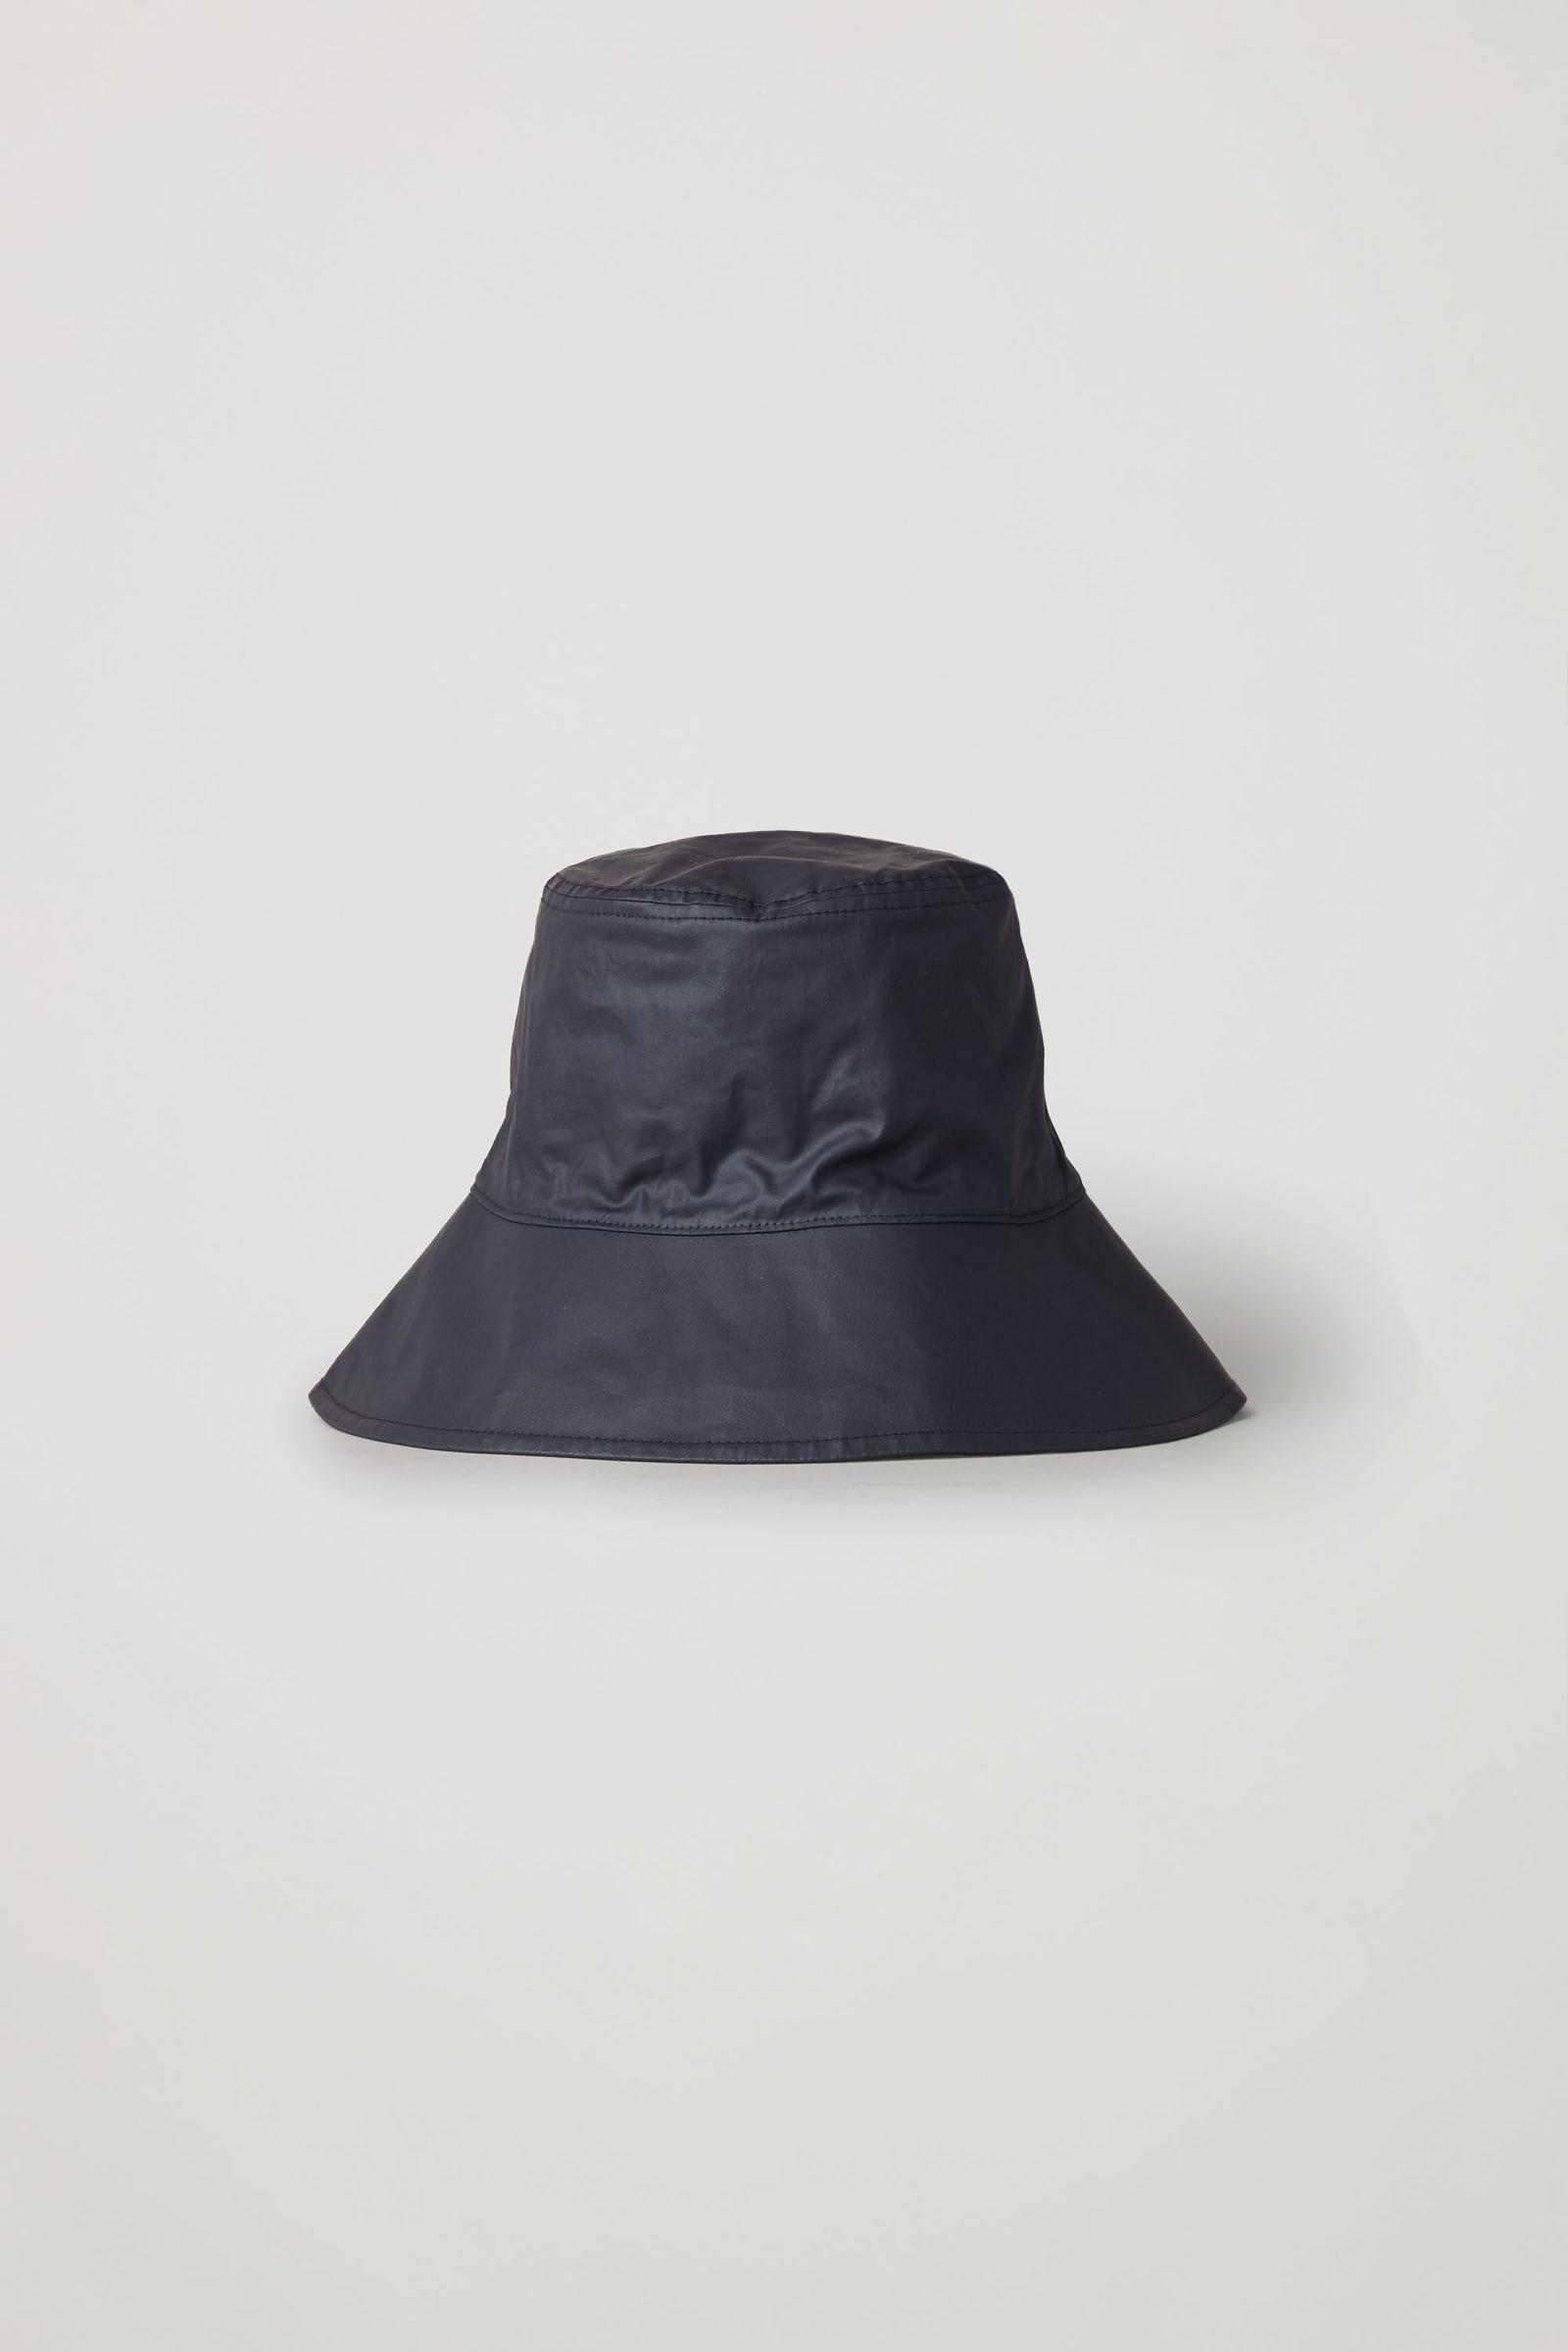 COS 코튼 버킷 햇의 블루컬러 Product입니다.